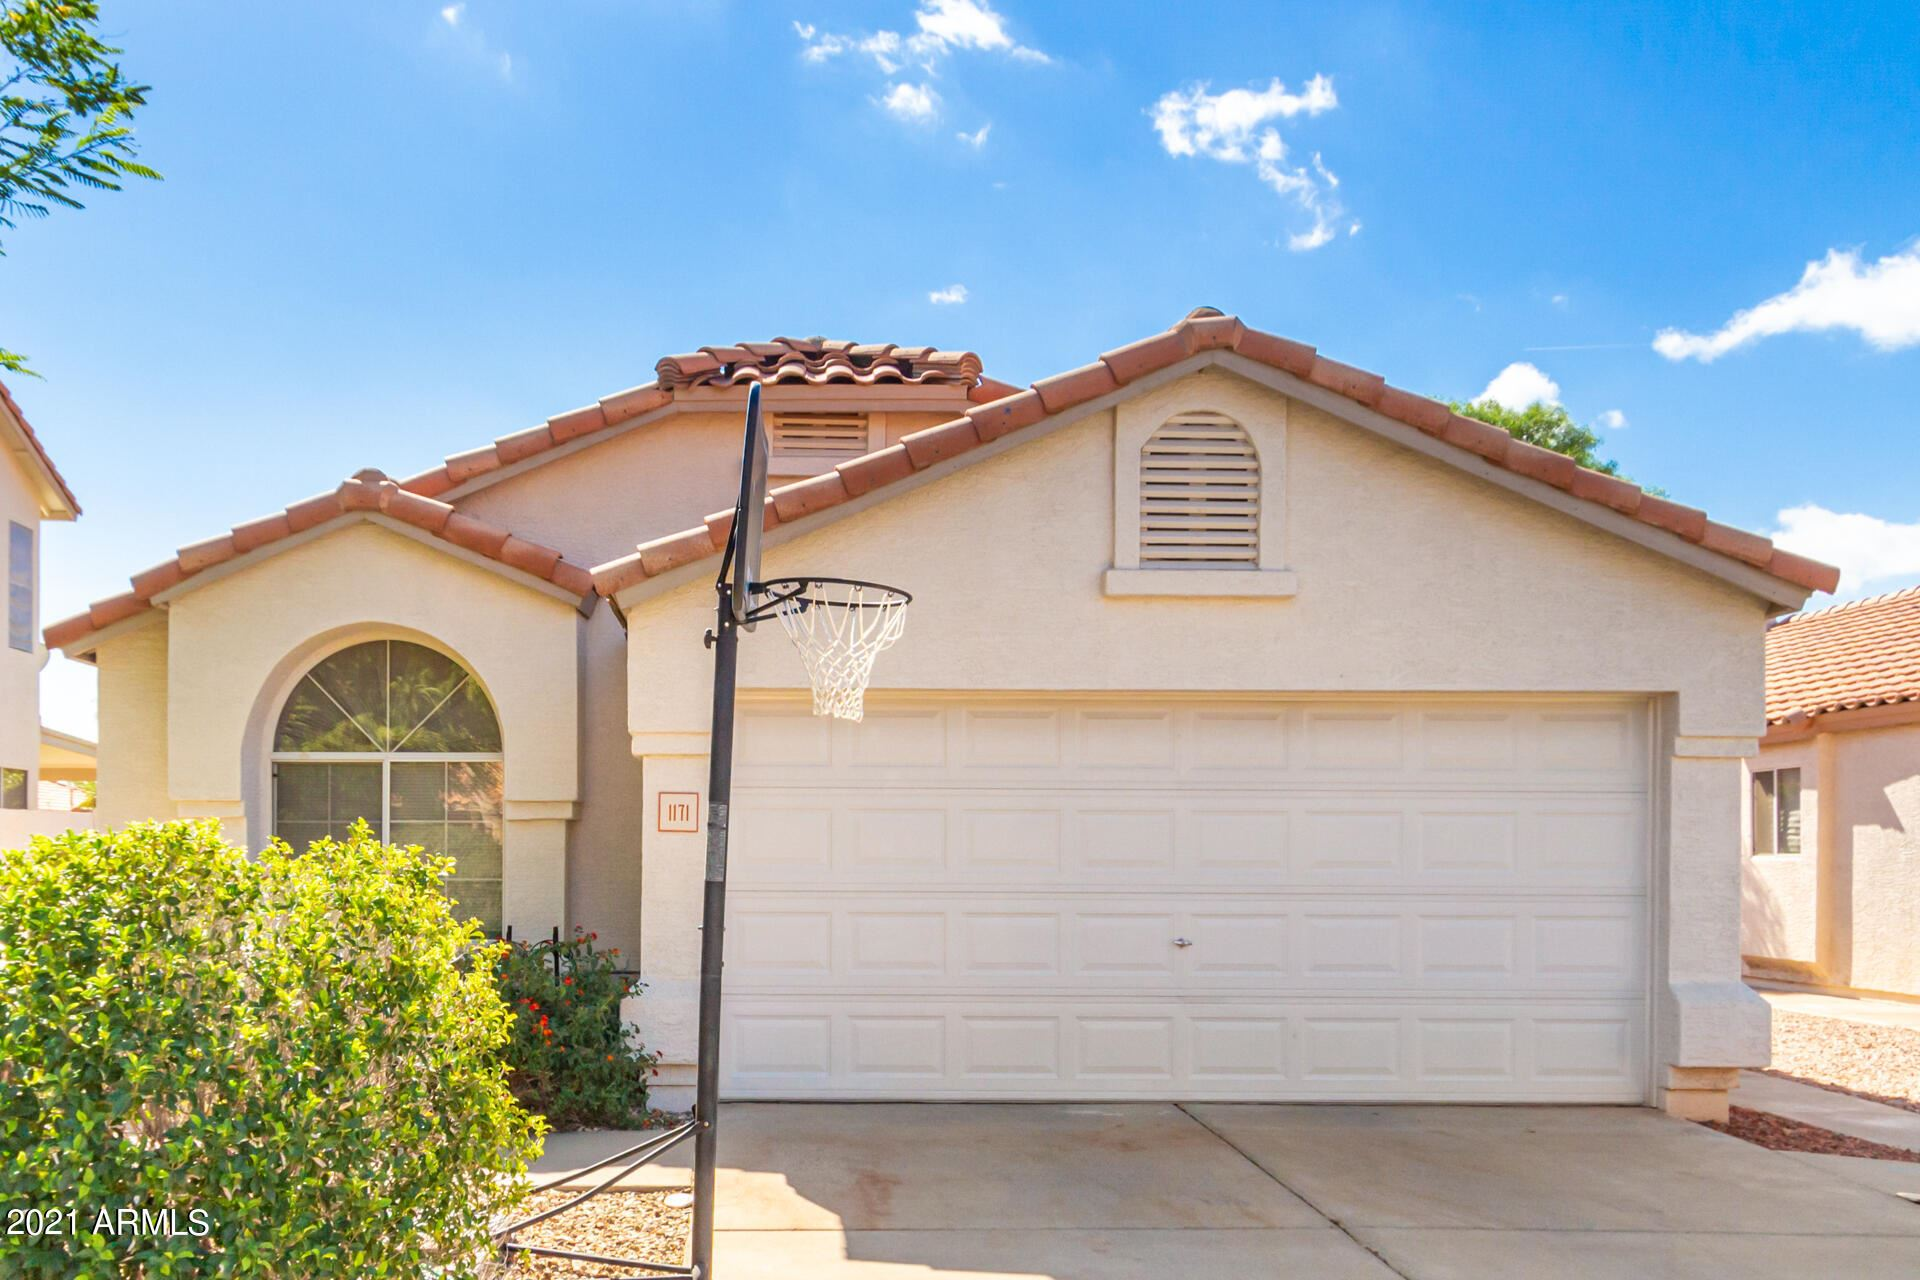 Photo of 1171 W KINGBIRD Drive, Chandler, AZ 85286 (MLS # 6311538)